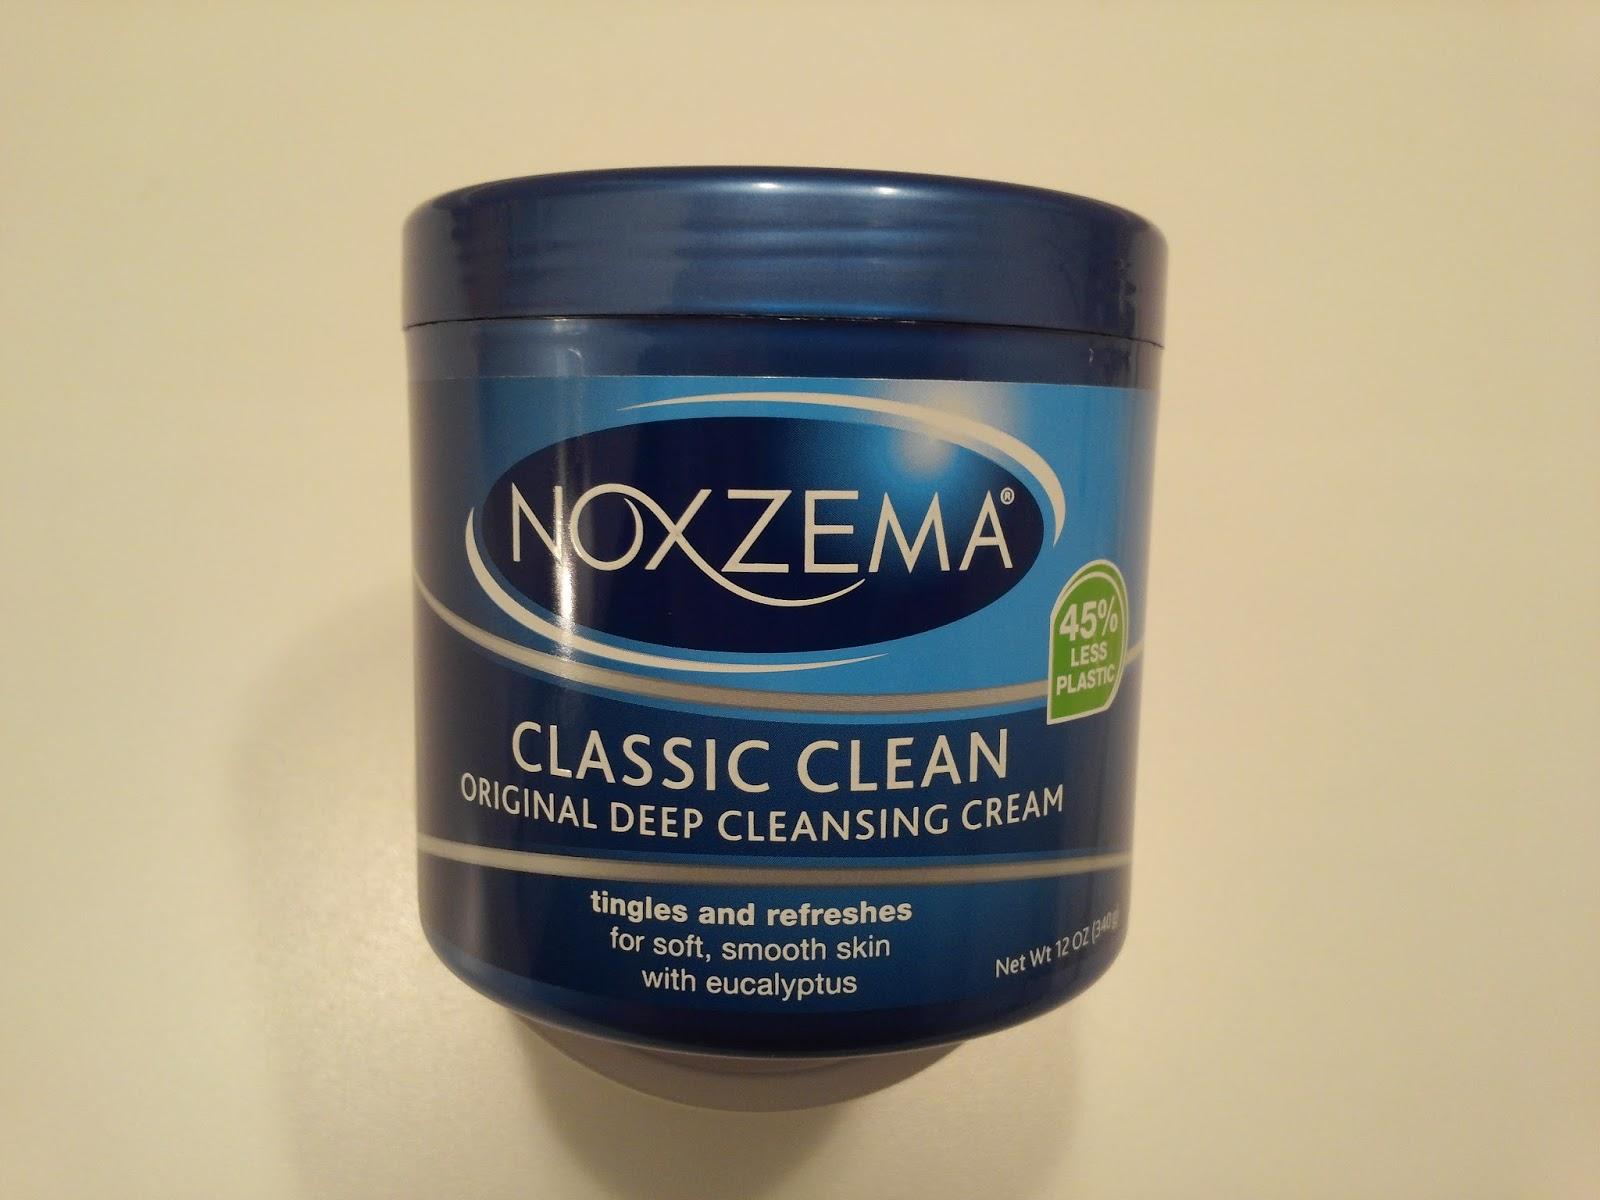 Shave Like Grandad Noxzema Instead Of Shave Oil On Sensitive Skin